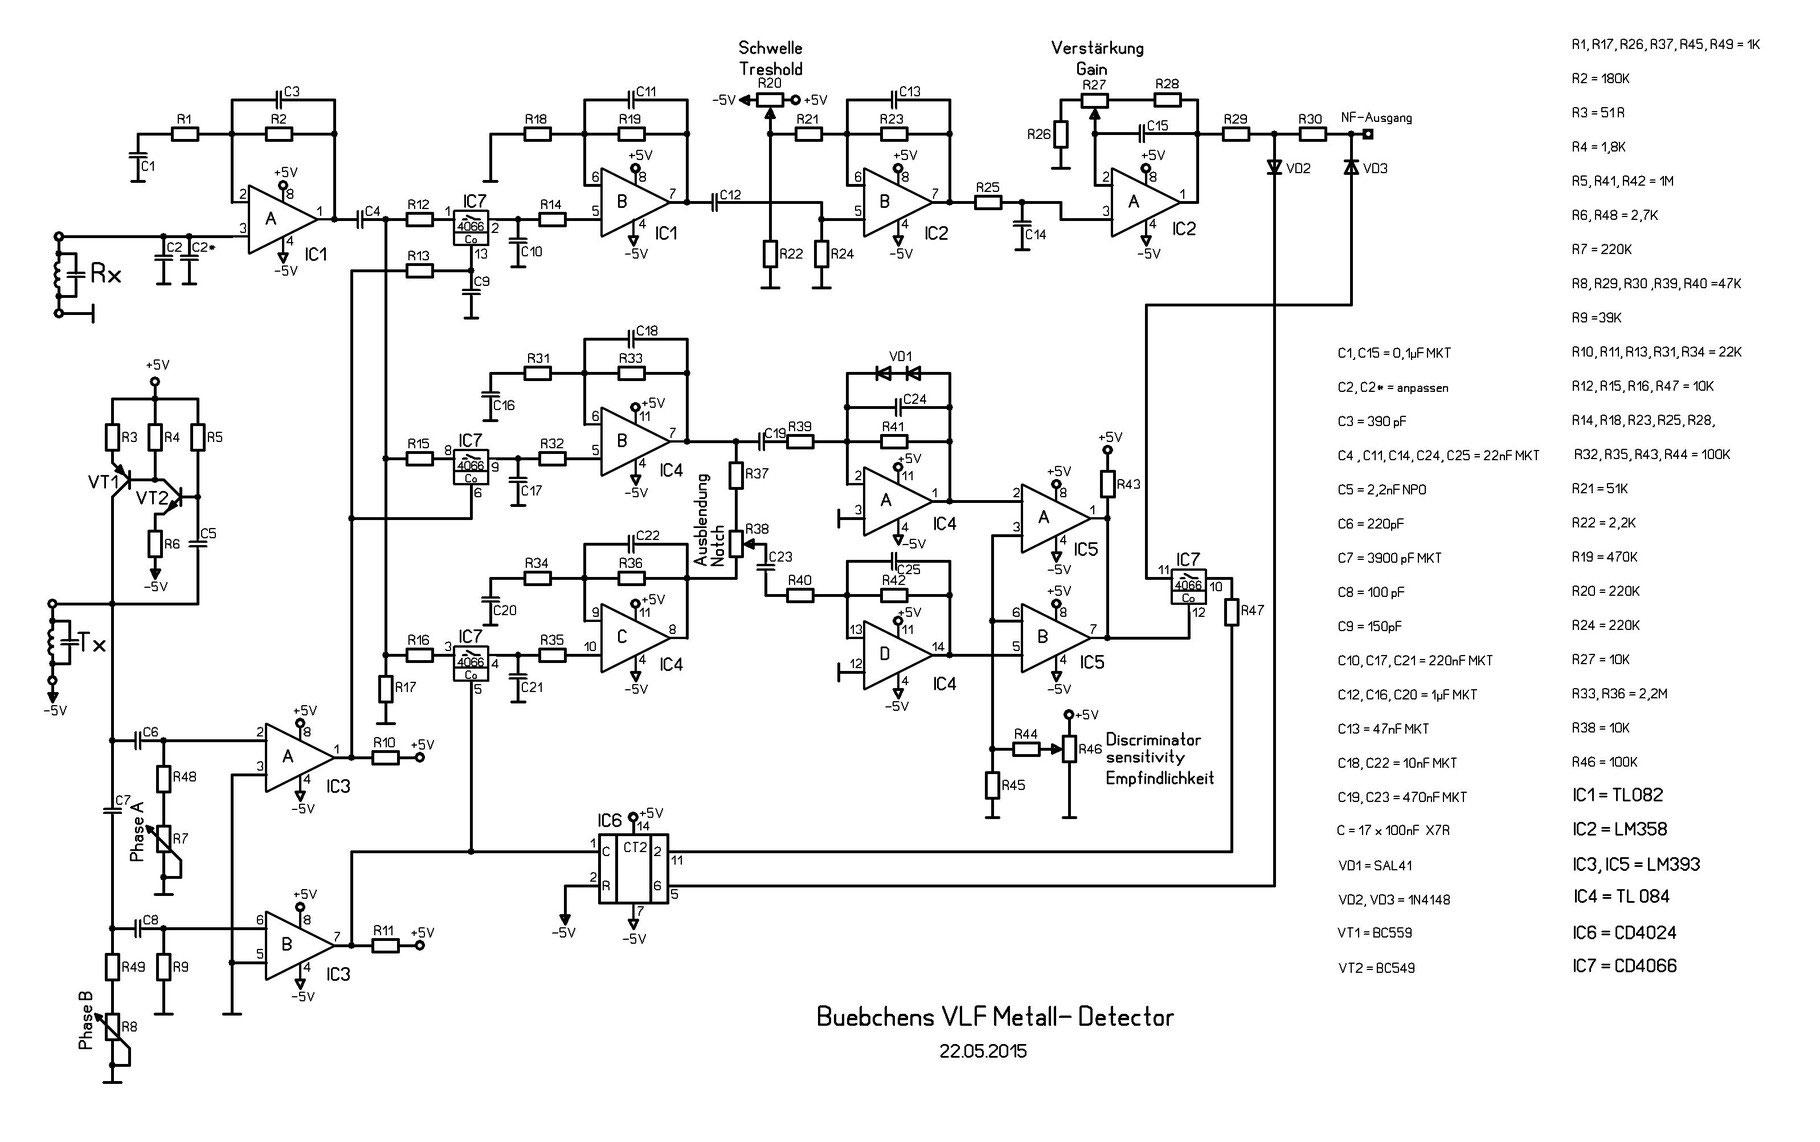 Vlf Metallsuchgert Das Hheren Ansprchen Gengt Buebchens Jimdo Metal Detector Circuits Schematics Schematic